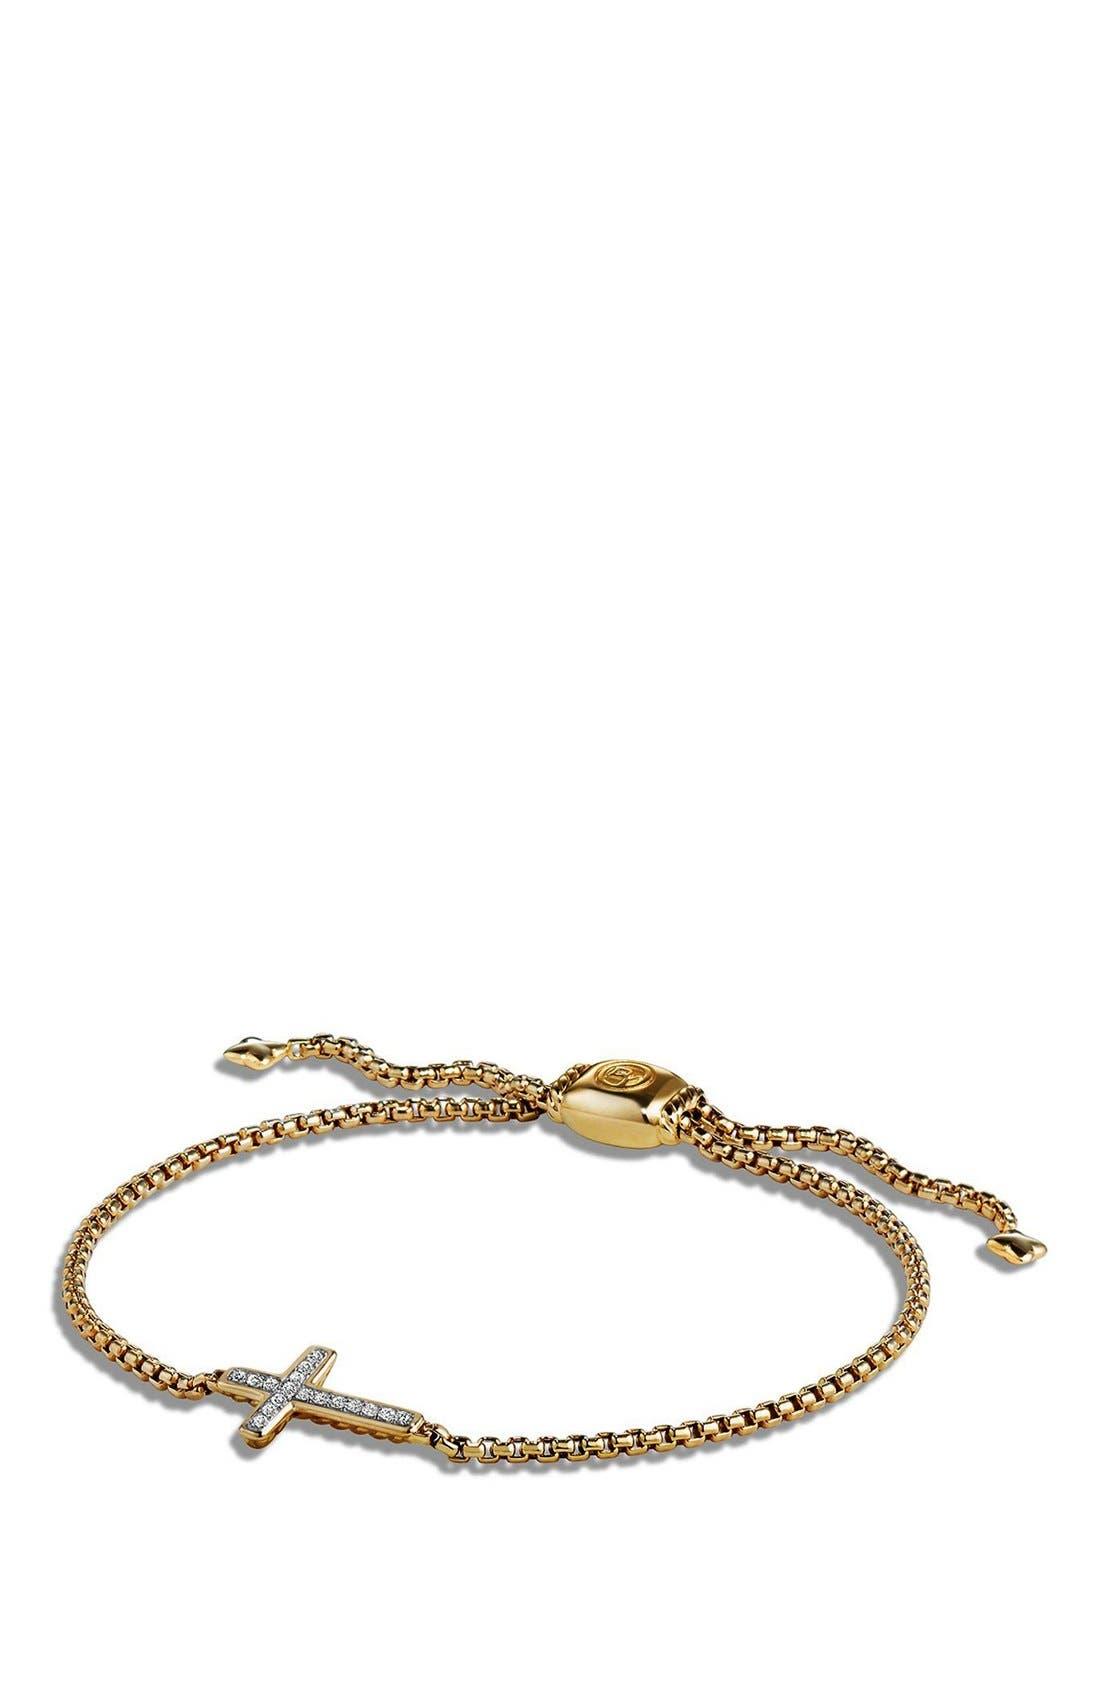 'Petite Pavé' Cross Bracelet with Diamonds in 18K Gold,                             Main thumbnail 1, color,                             GOLD